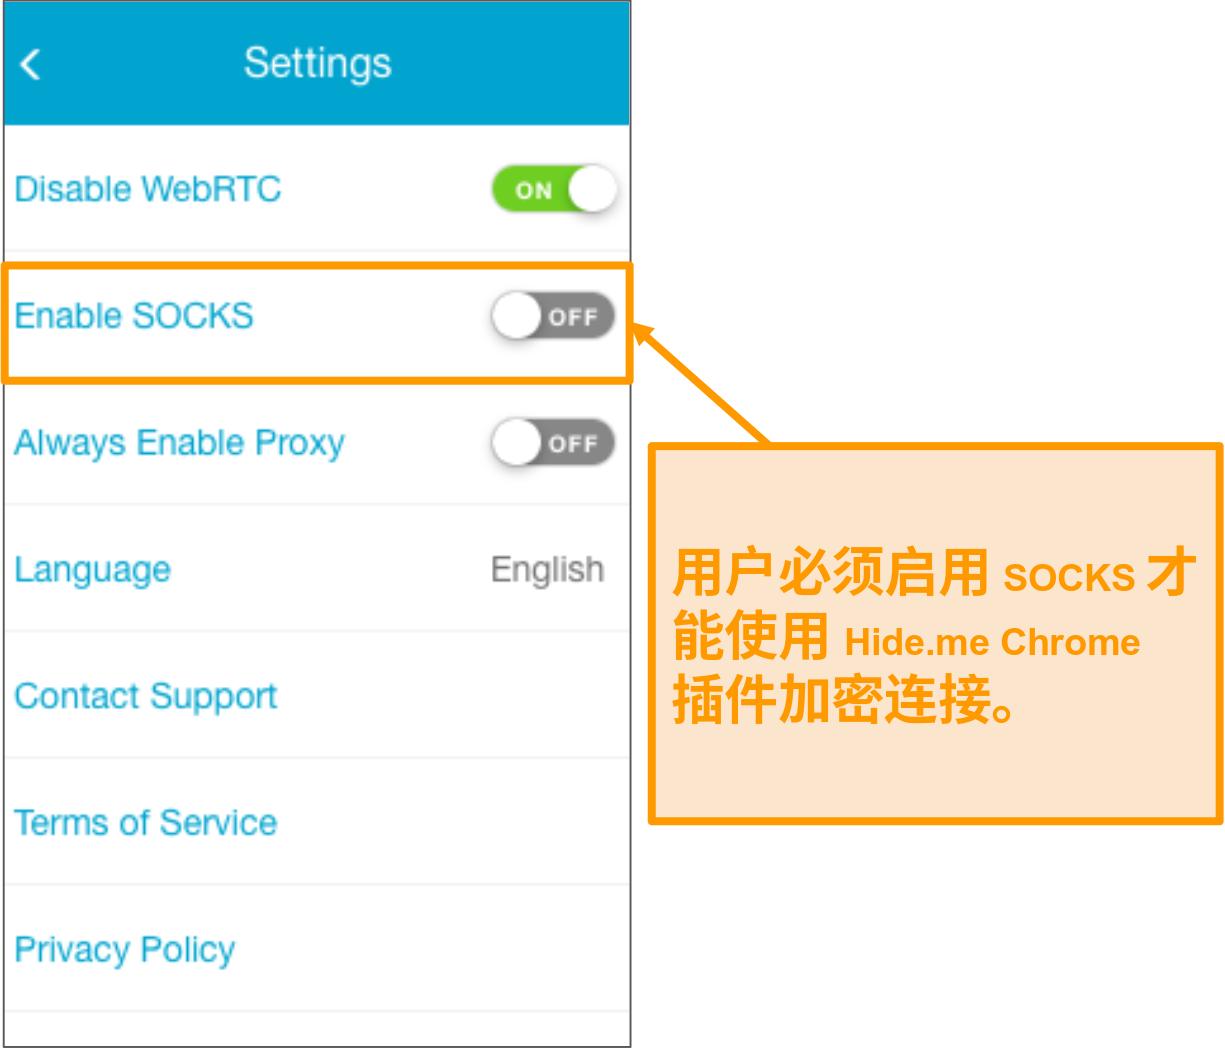 Hide.me浏览器扩展程序设置的屏幕截图。